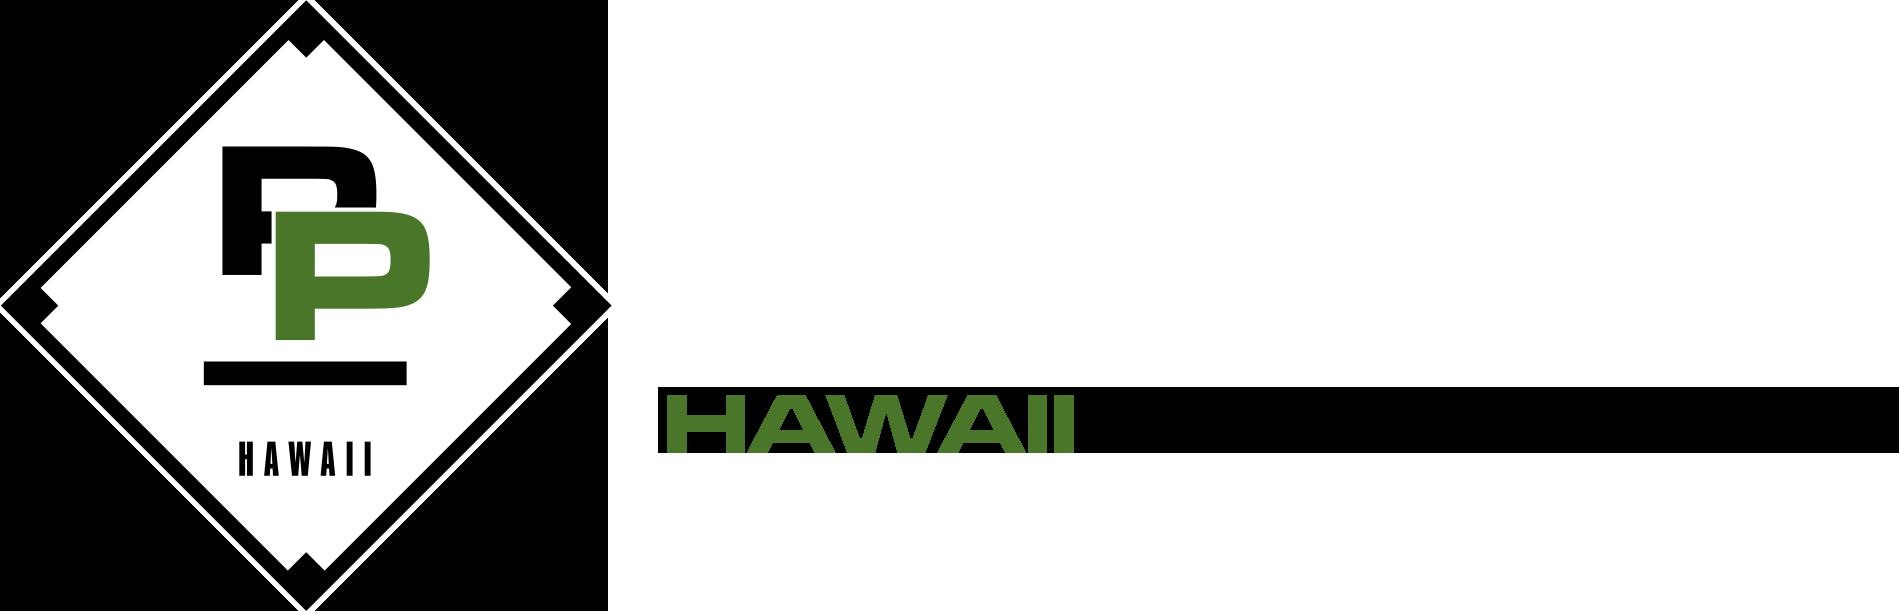 Pitching Performance Hawaii